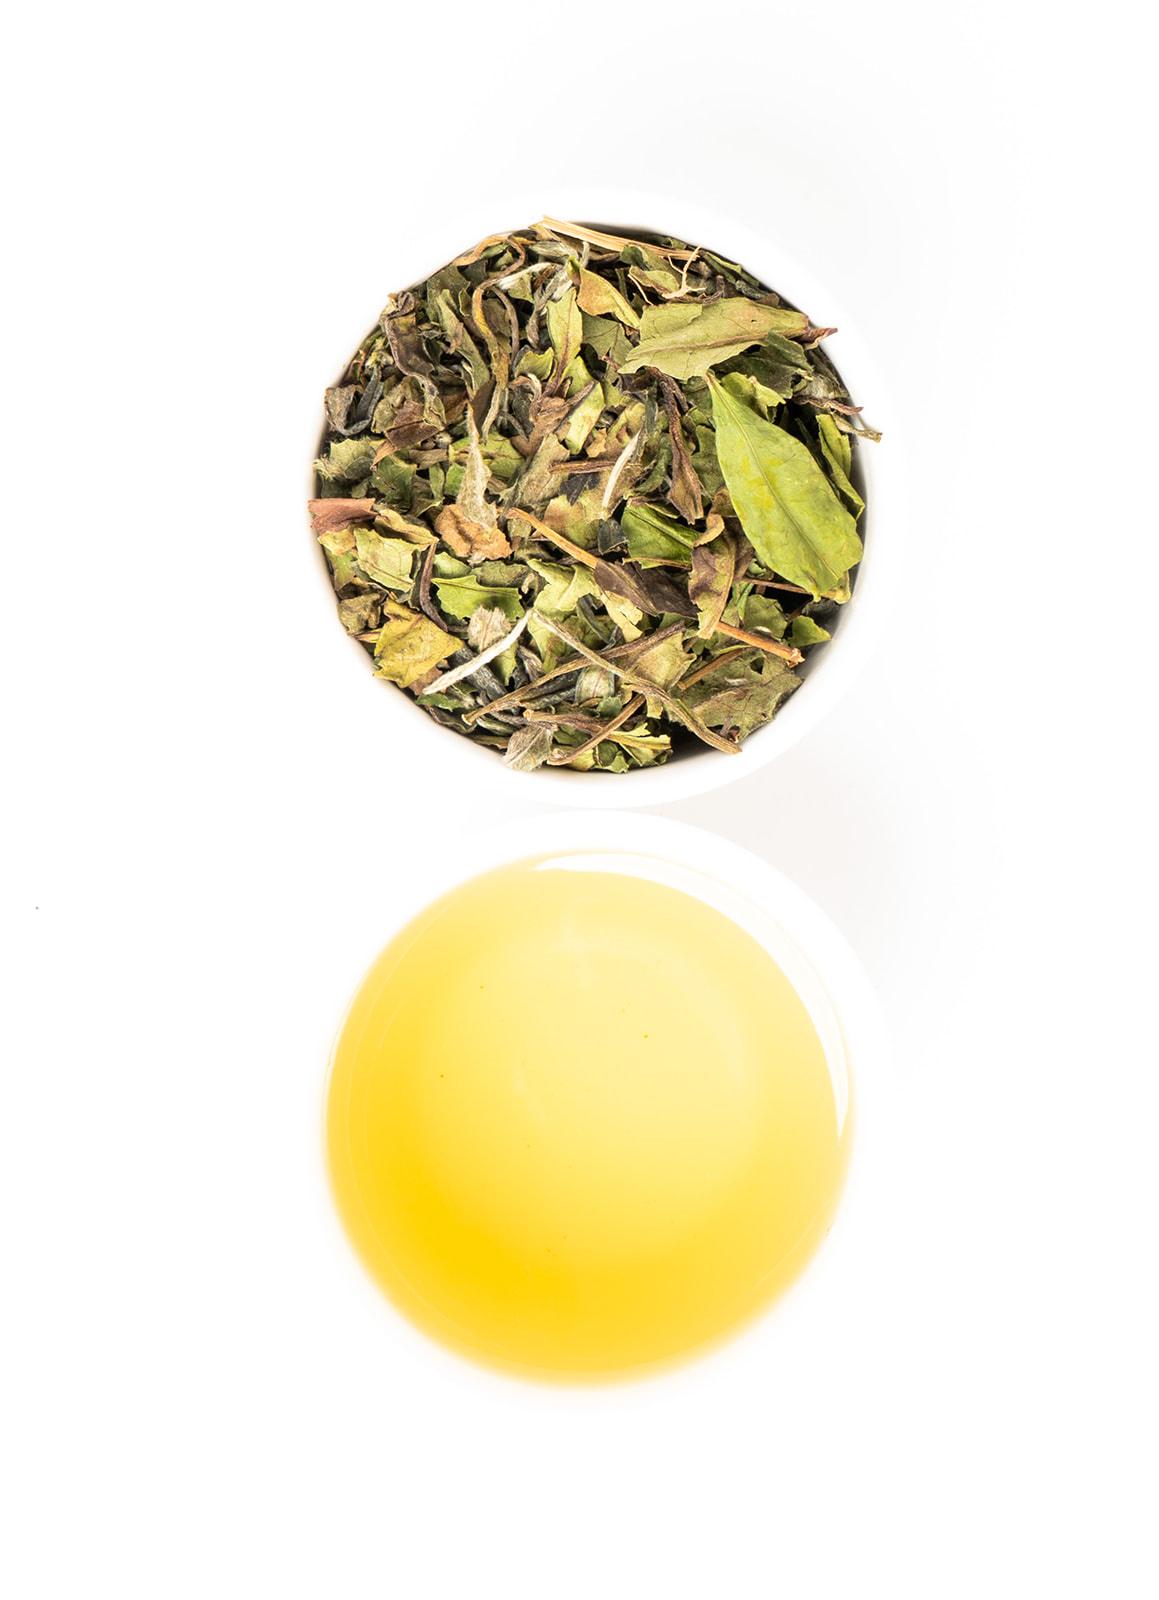 Organic White Sun - white tea